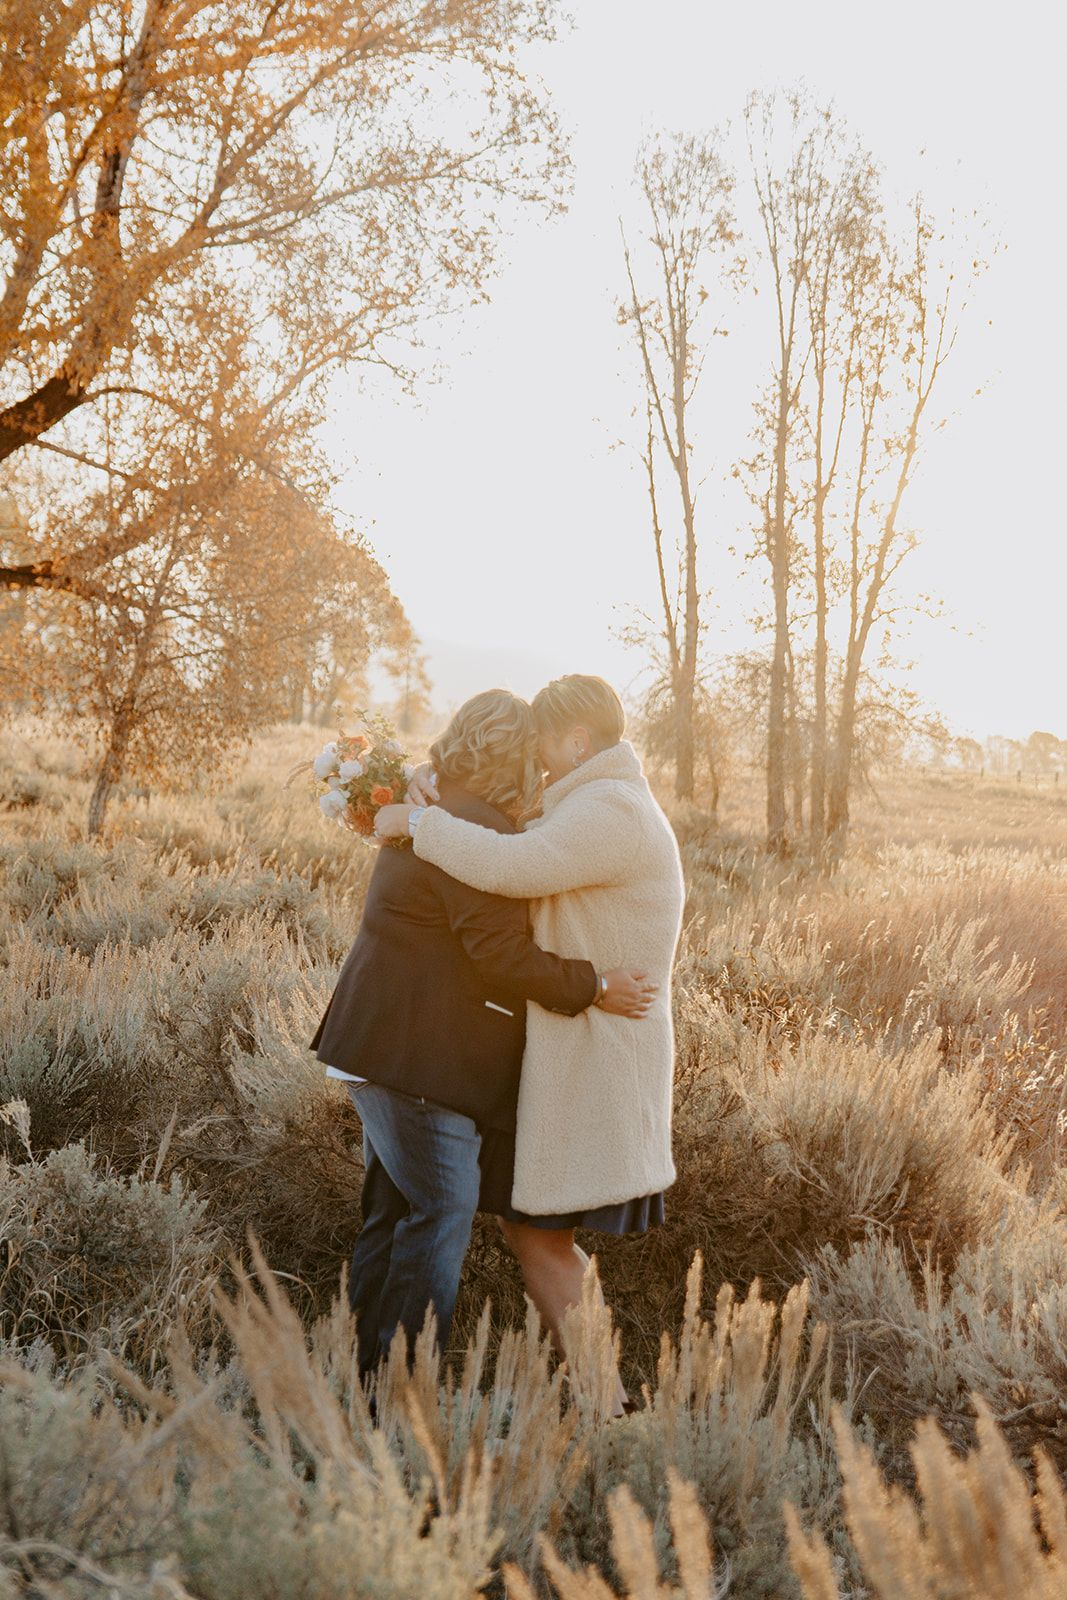 wyoming-elopement-package-wedding_websize-large